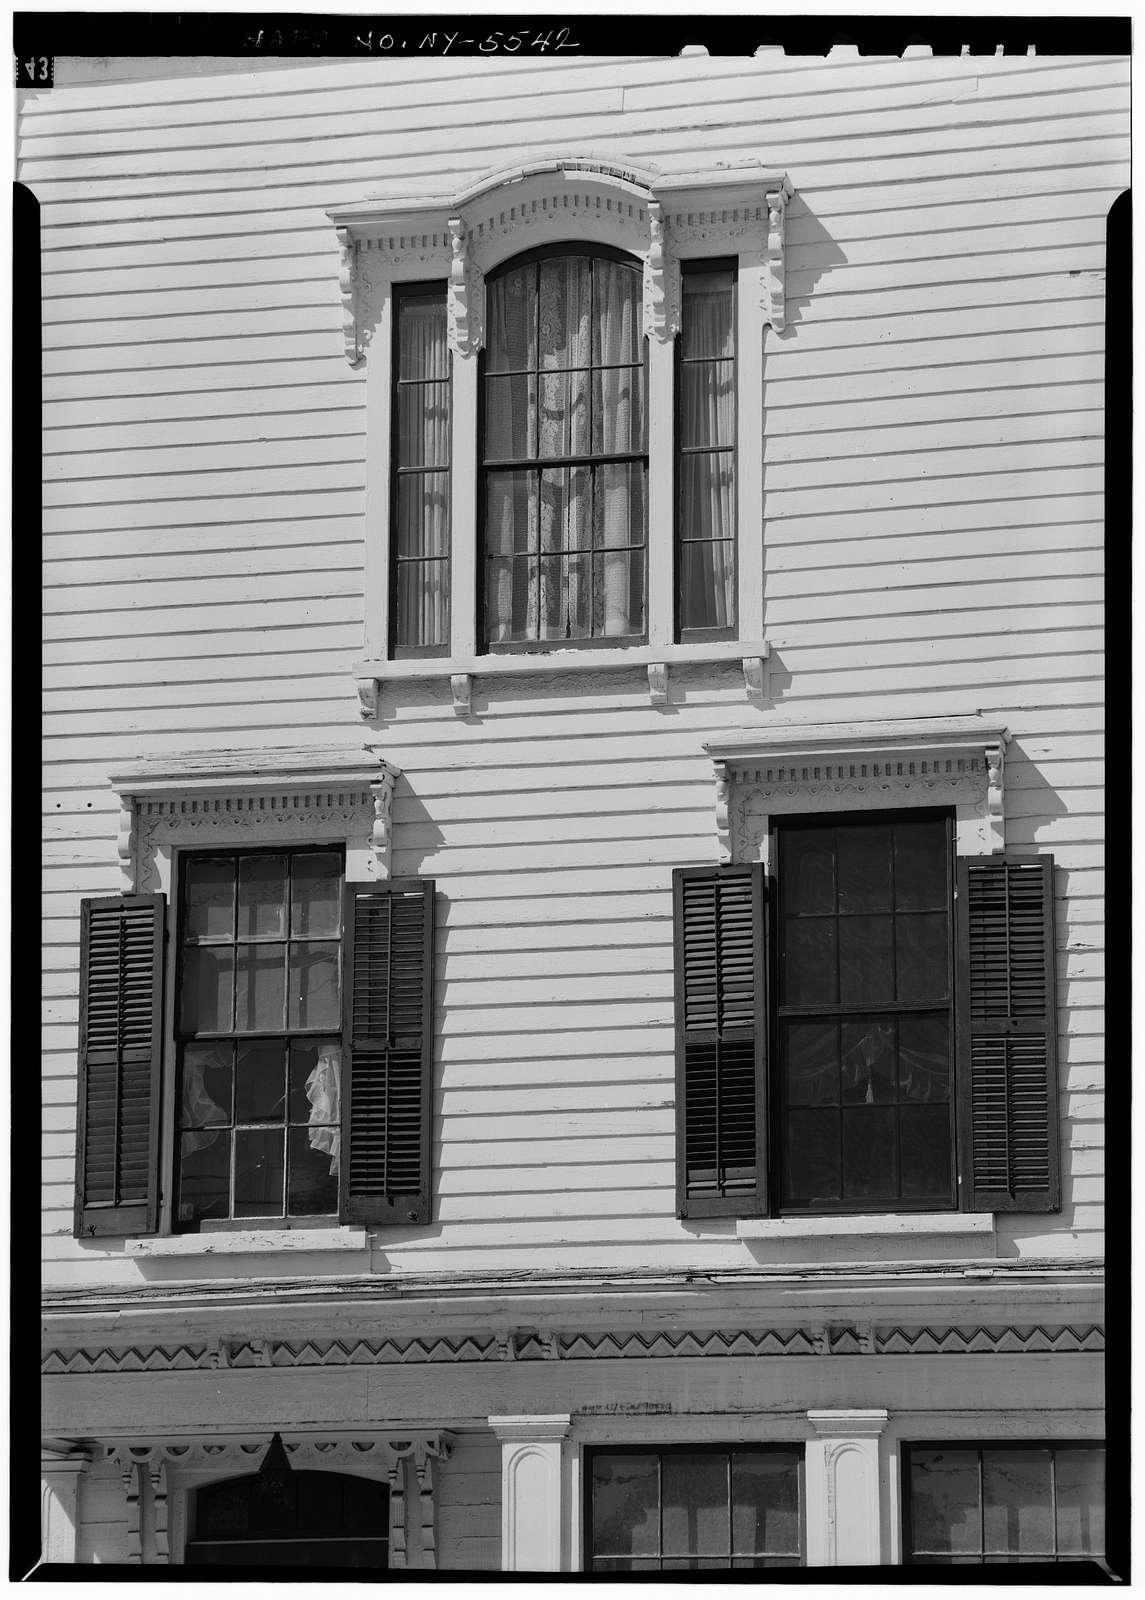 Sheldon Hyde House, 97 Second Street, Deposit, Broome County, NY